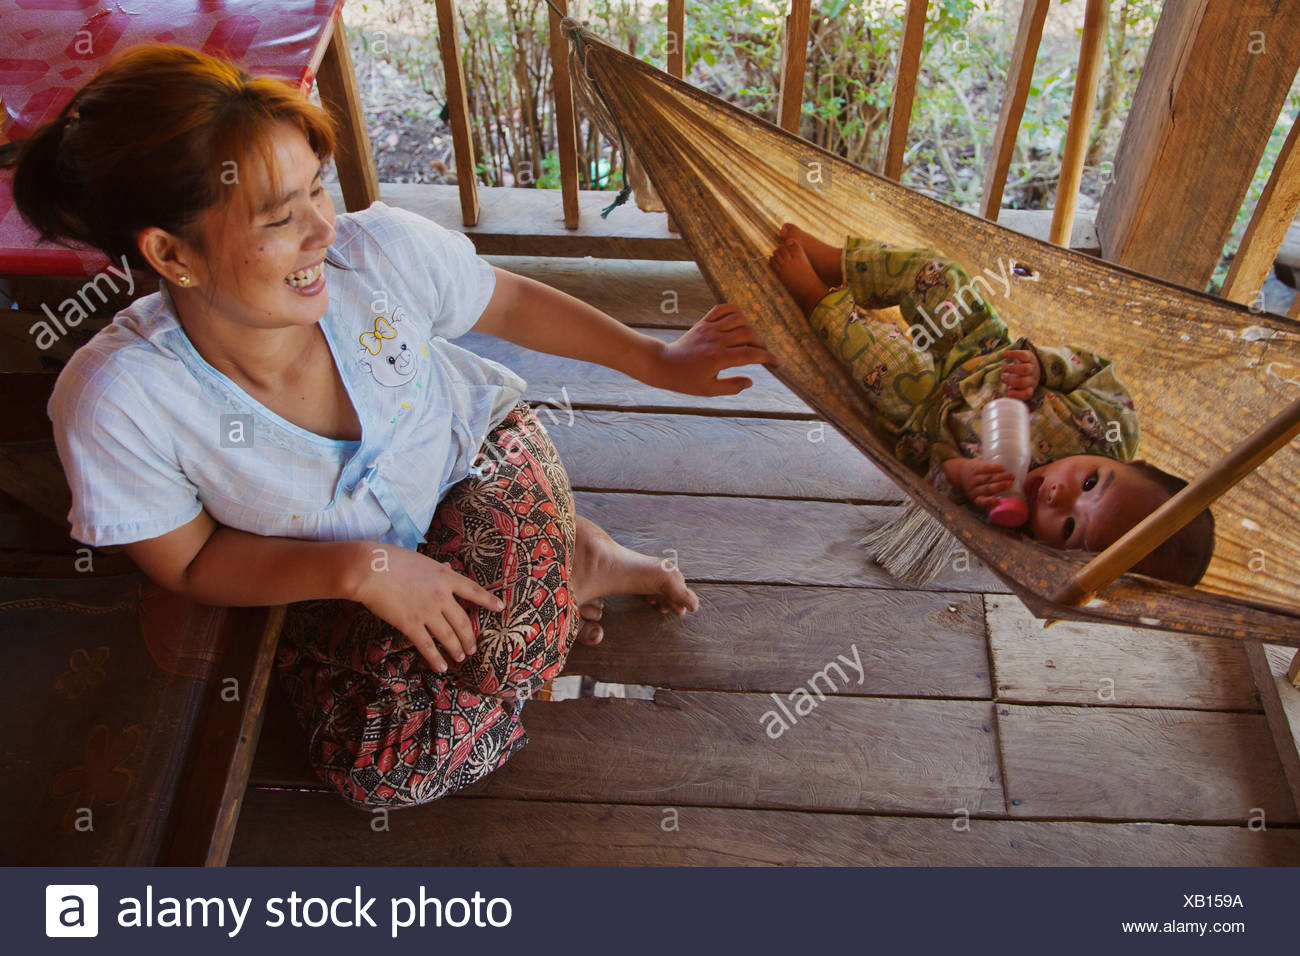 a mother rocks her baby lying in a hammock, Burma, Kengtung, Kyaingtong - Stock Image